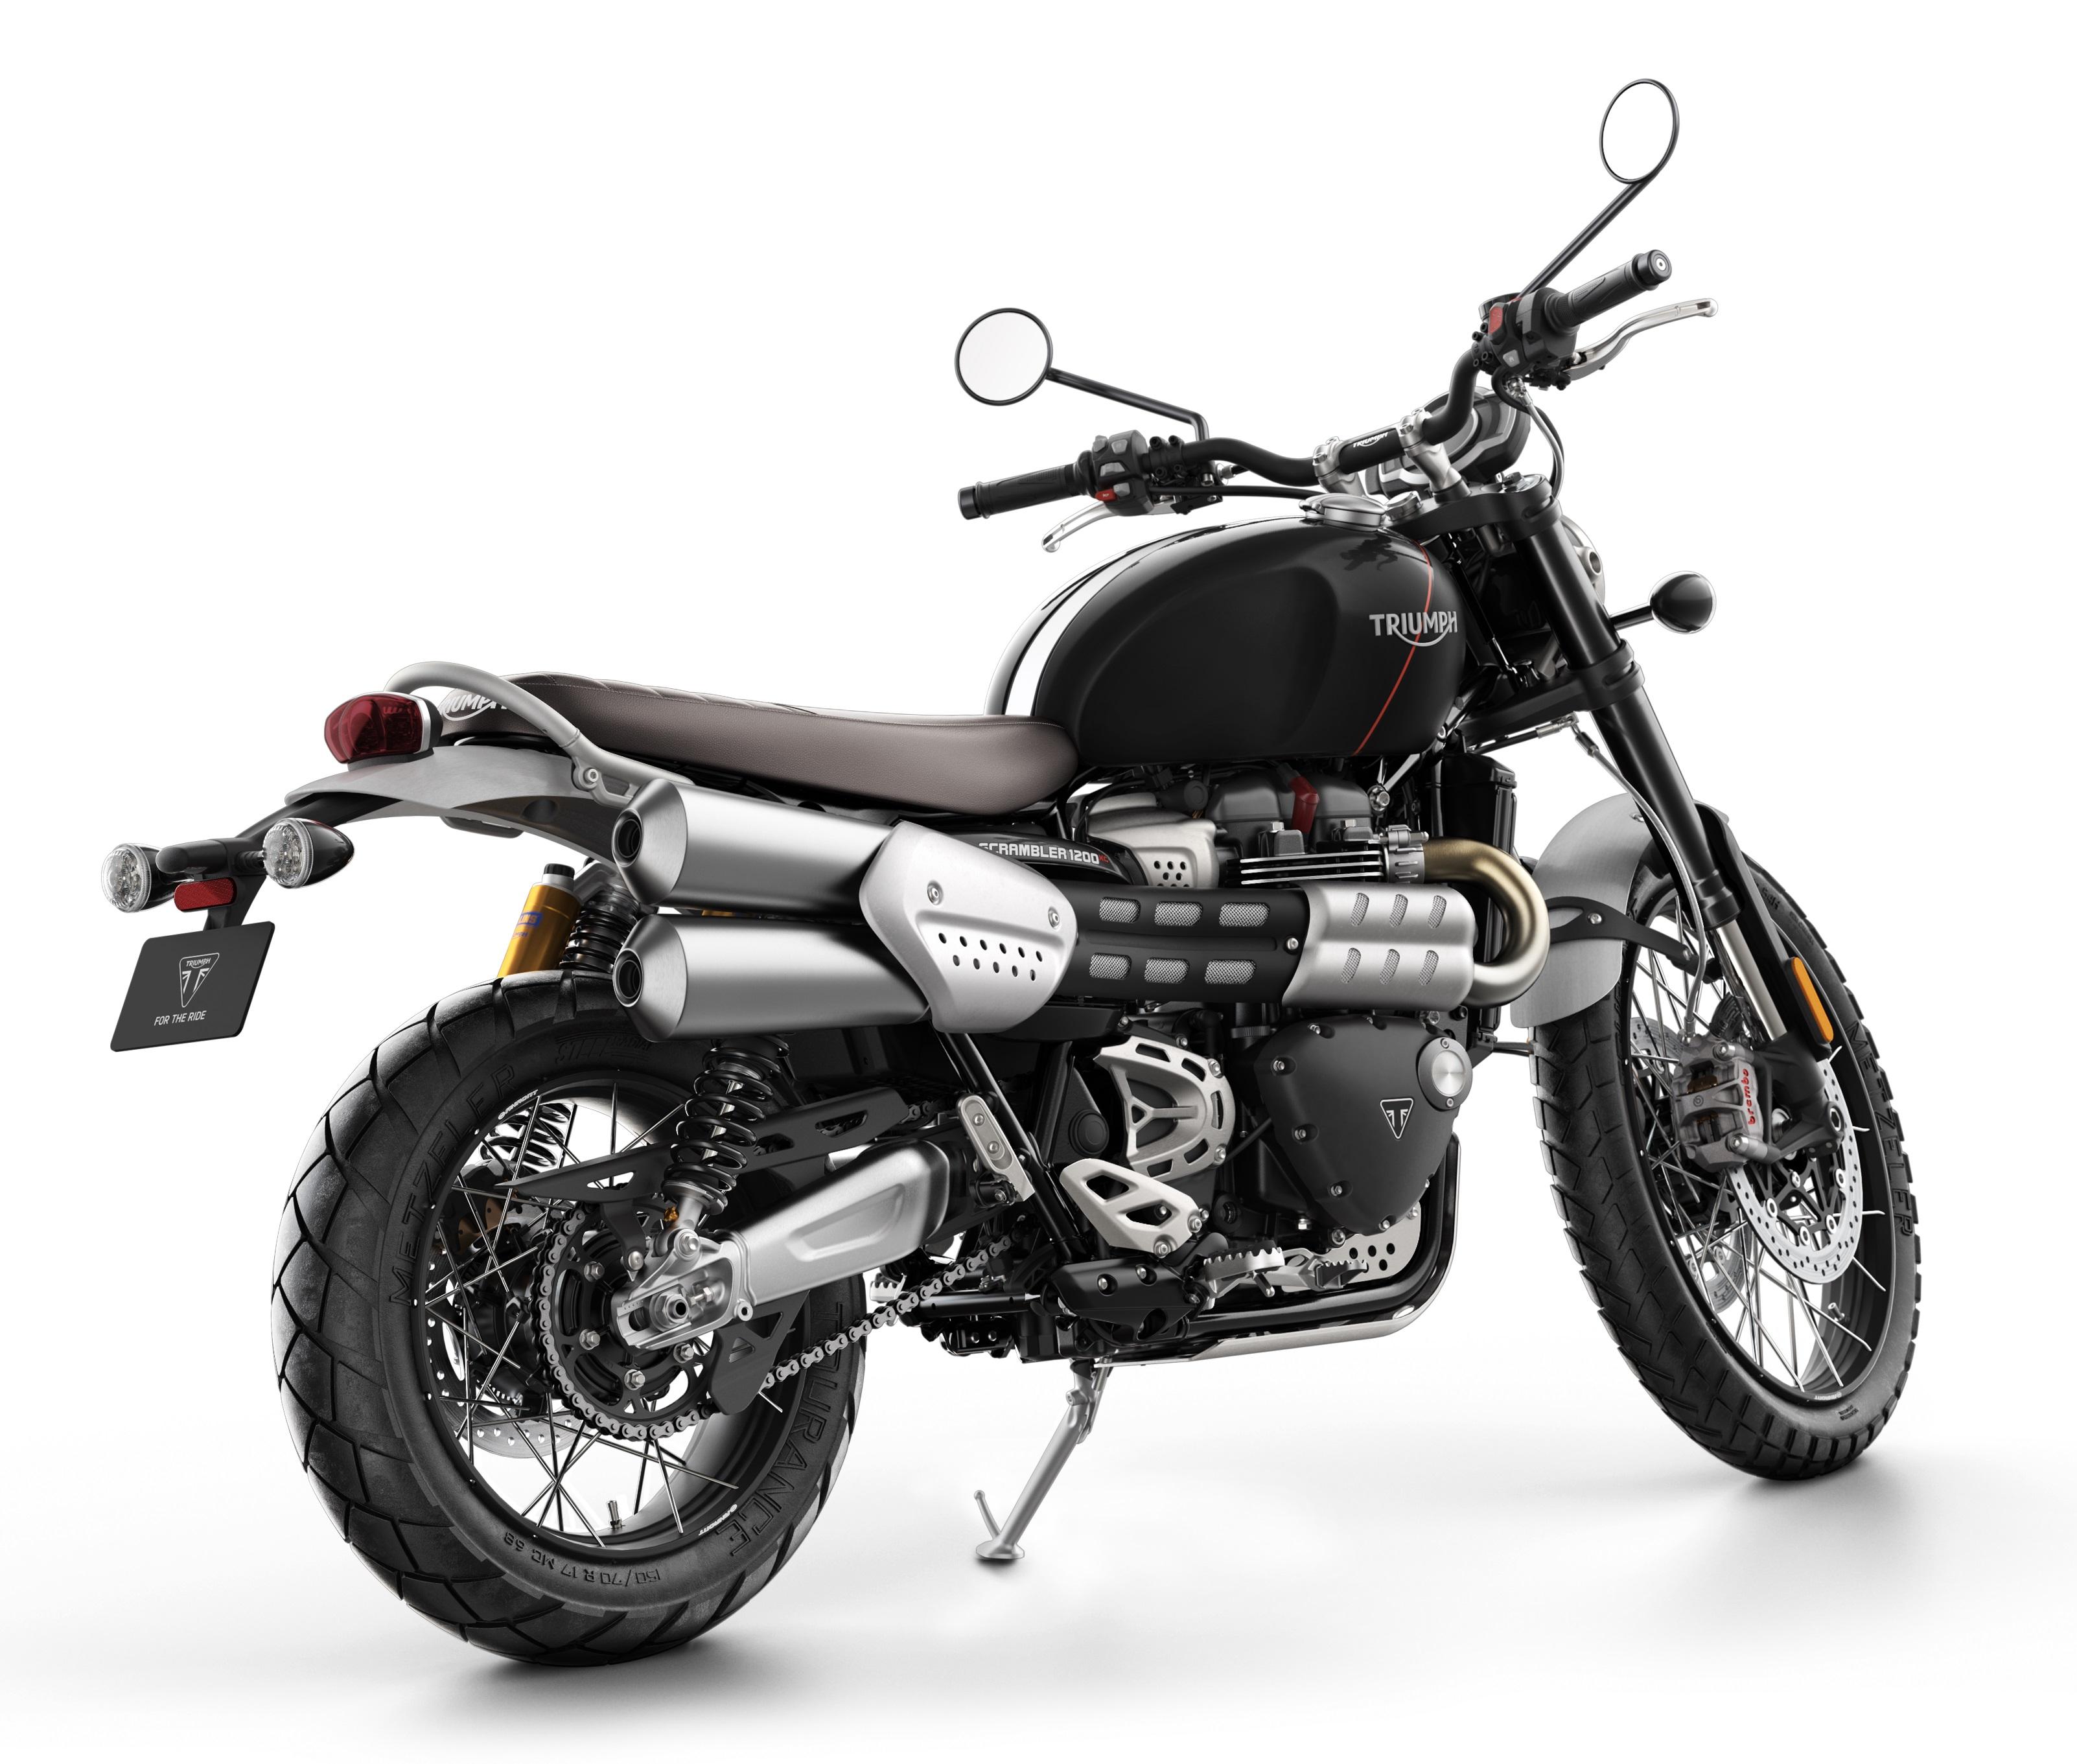 For Sale: Triumph Scrambler 1200 XC • The Bike Market